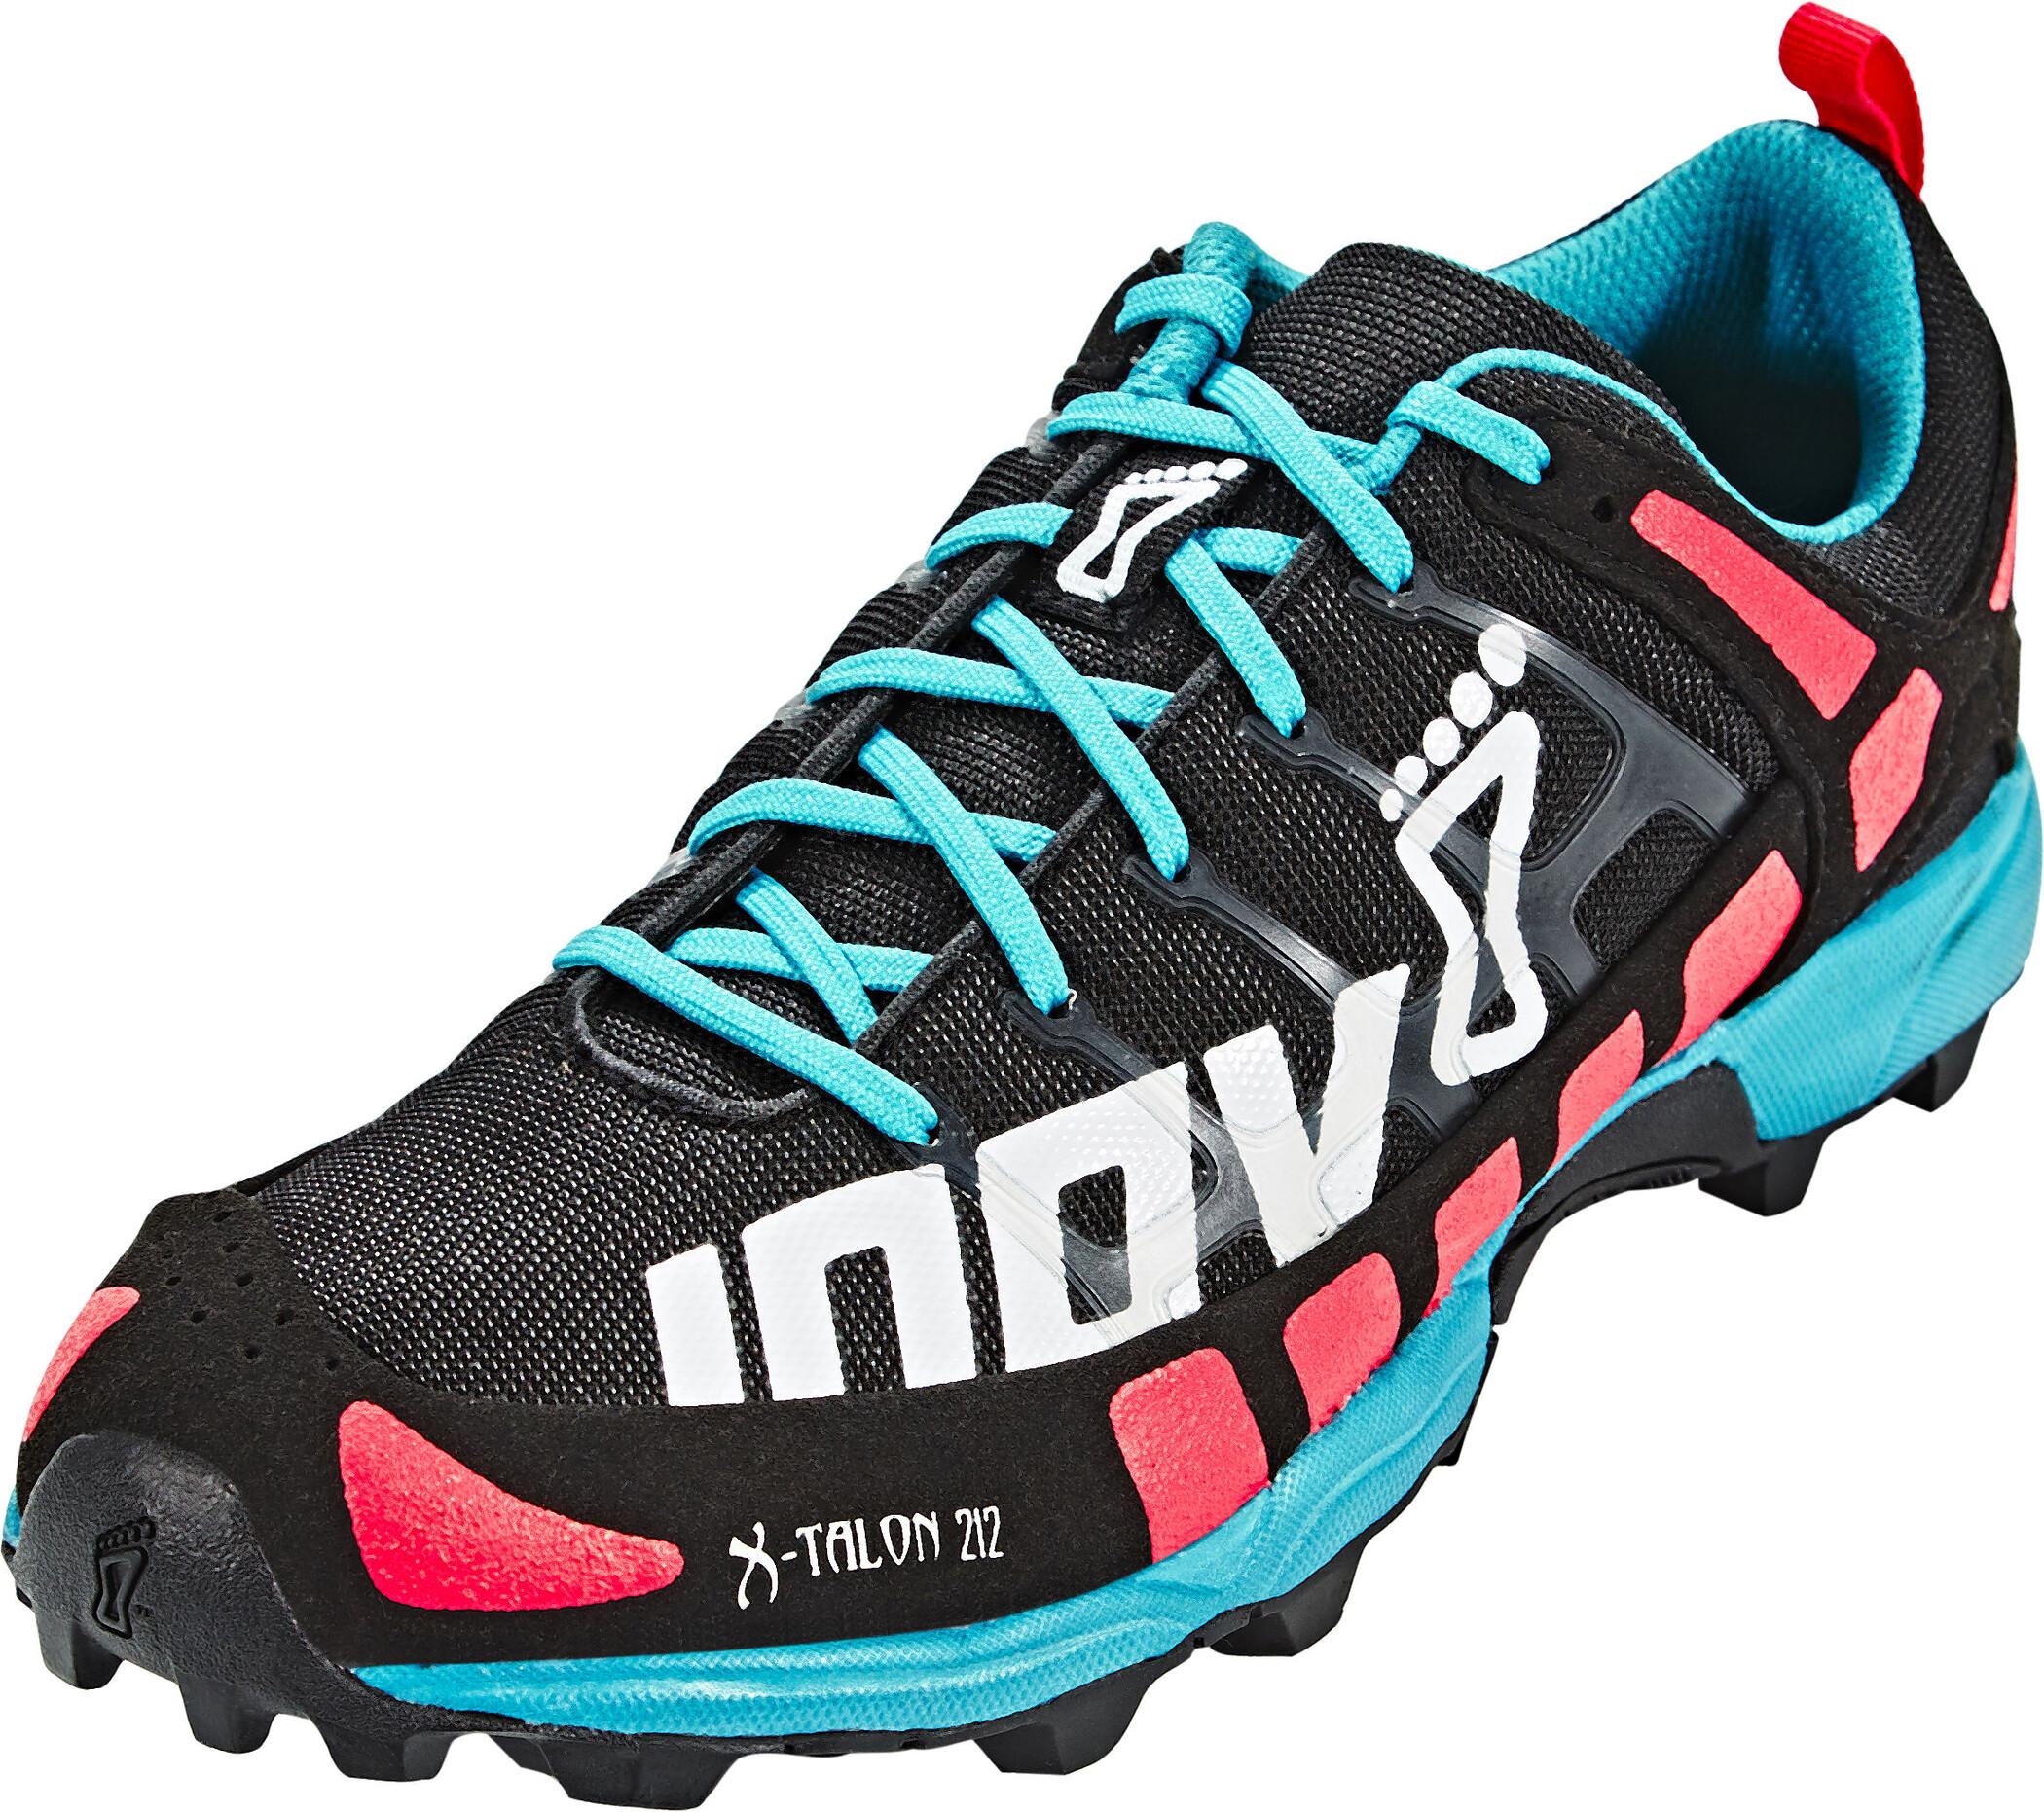 inov-8 X-Talon 212 Løbesko Damer, black/pink/teal   Running shoes